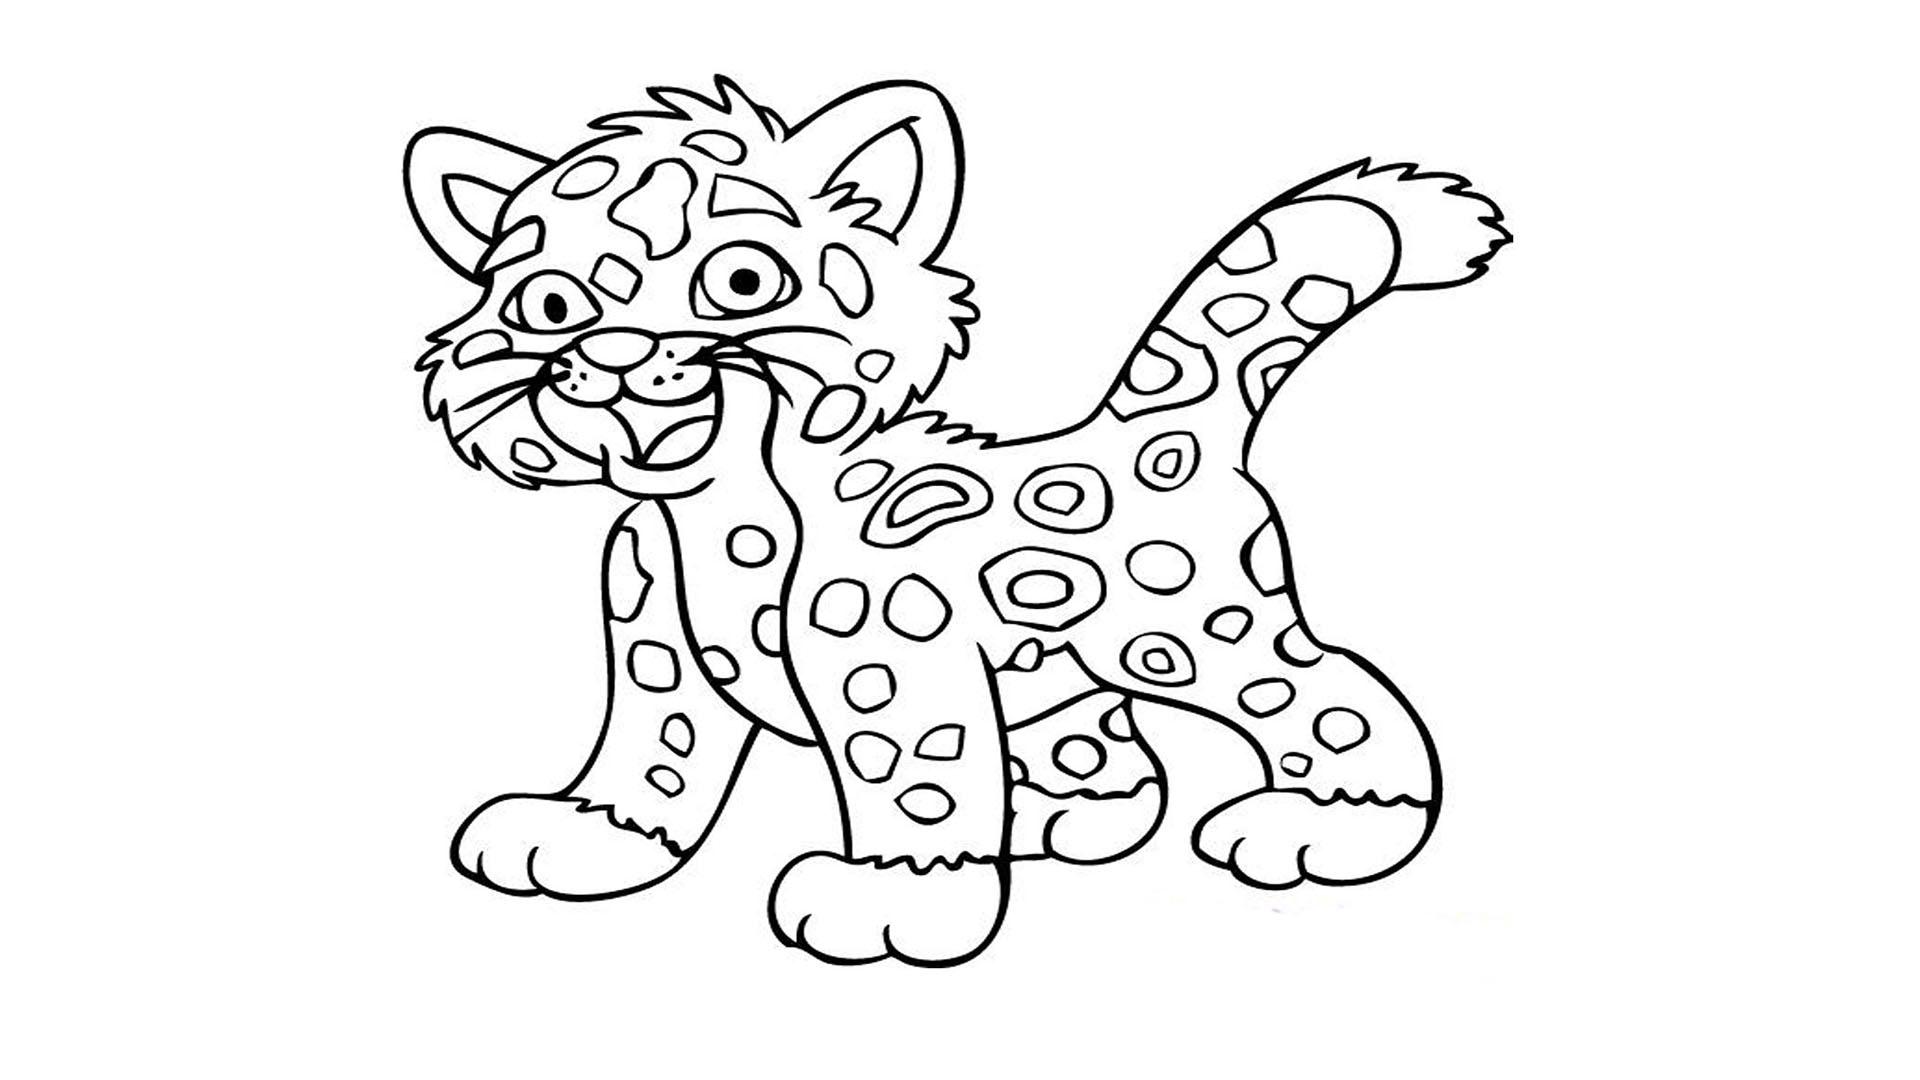 Printable Tiger Coloring Pages At Getdrawings